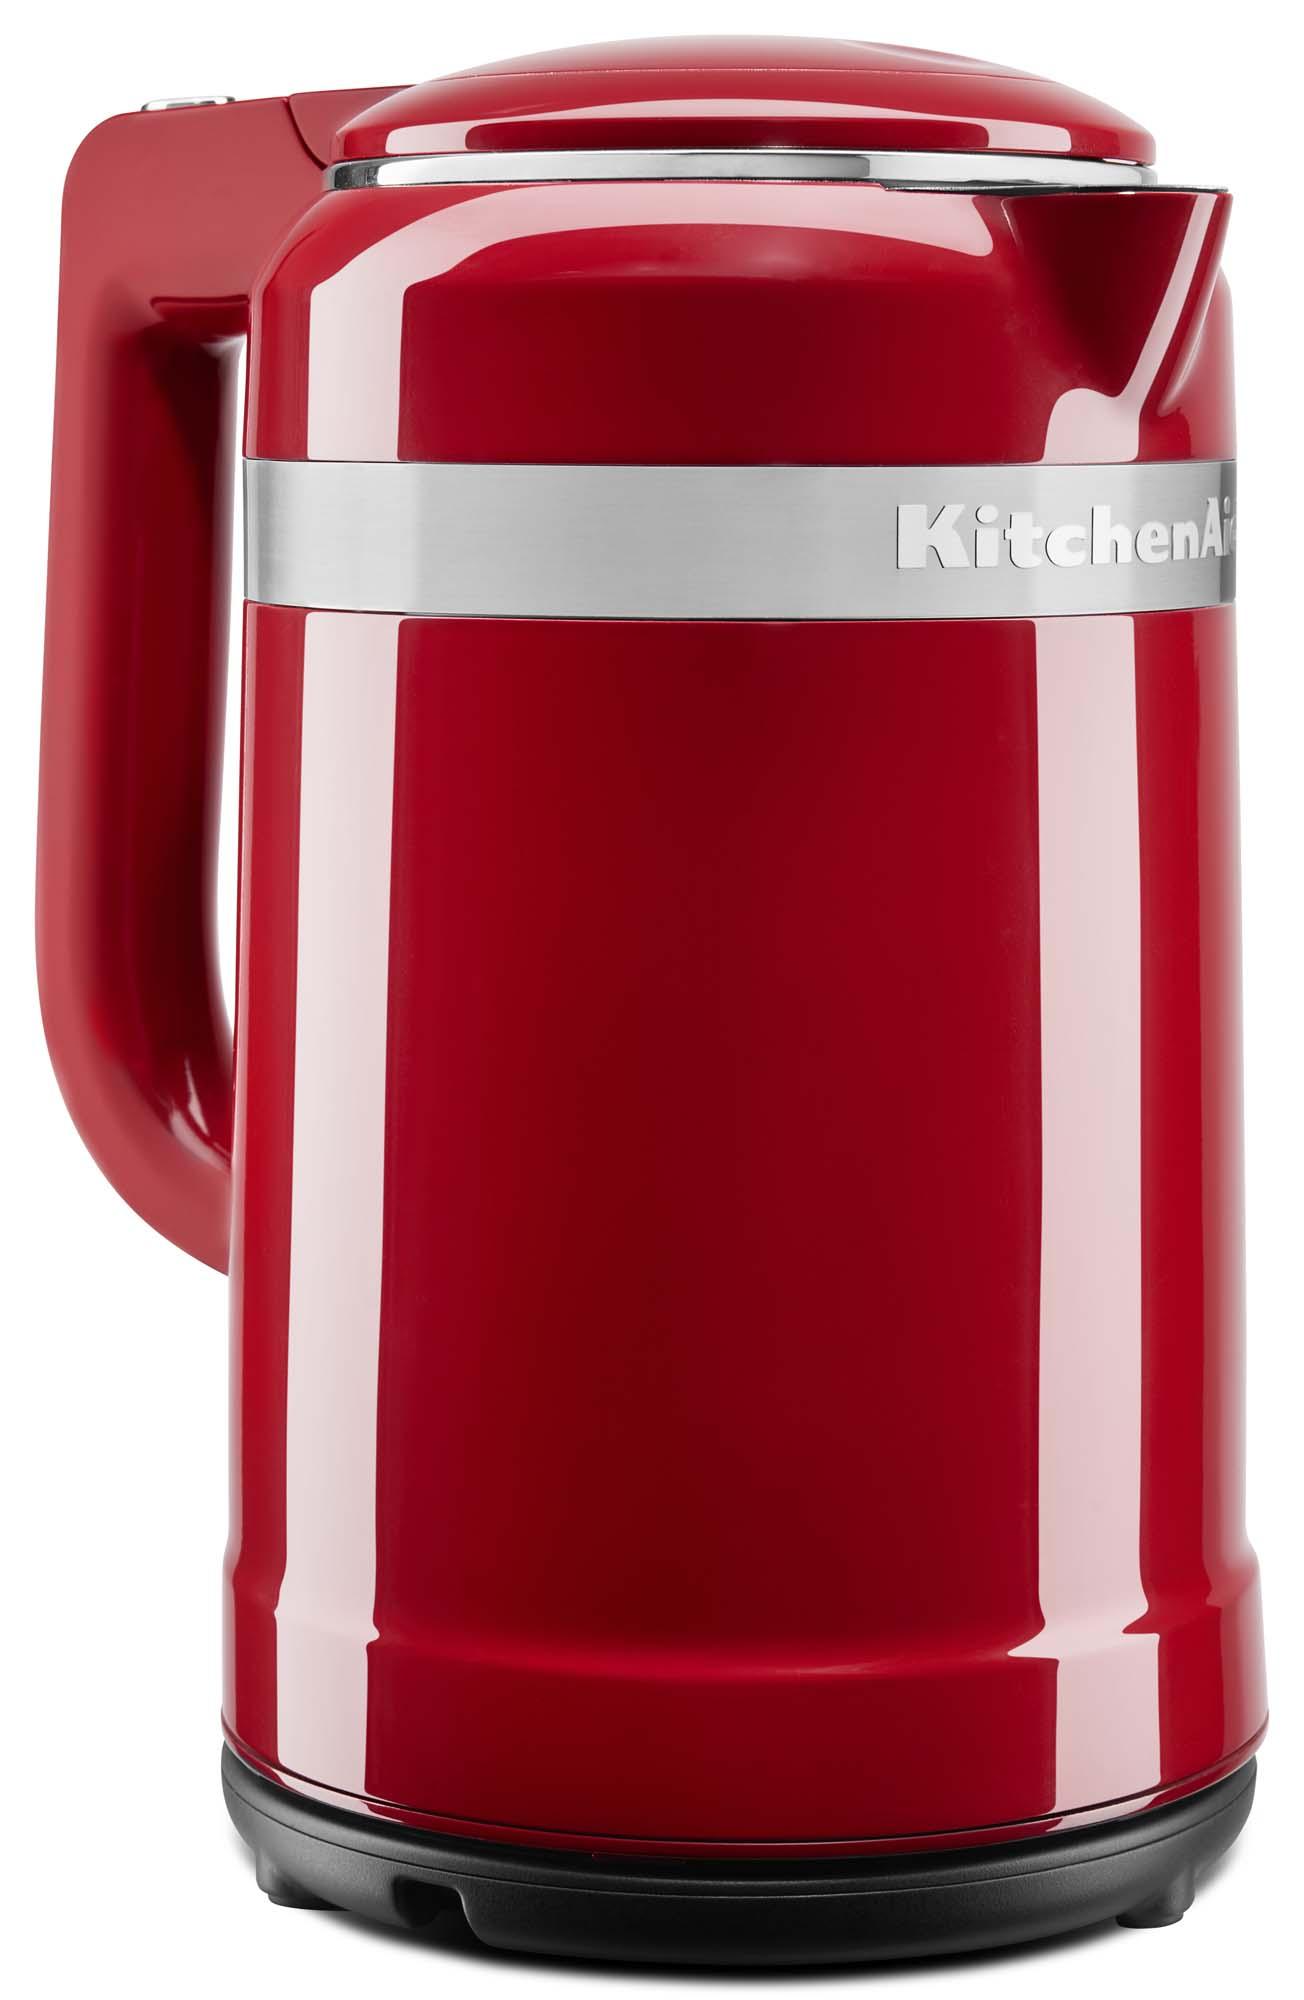 KitchenAid Vattenkokare 5KEK1565EER 1,5L Röd